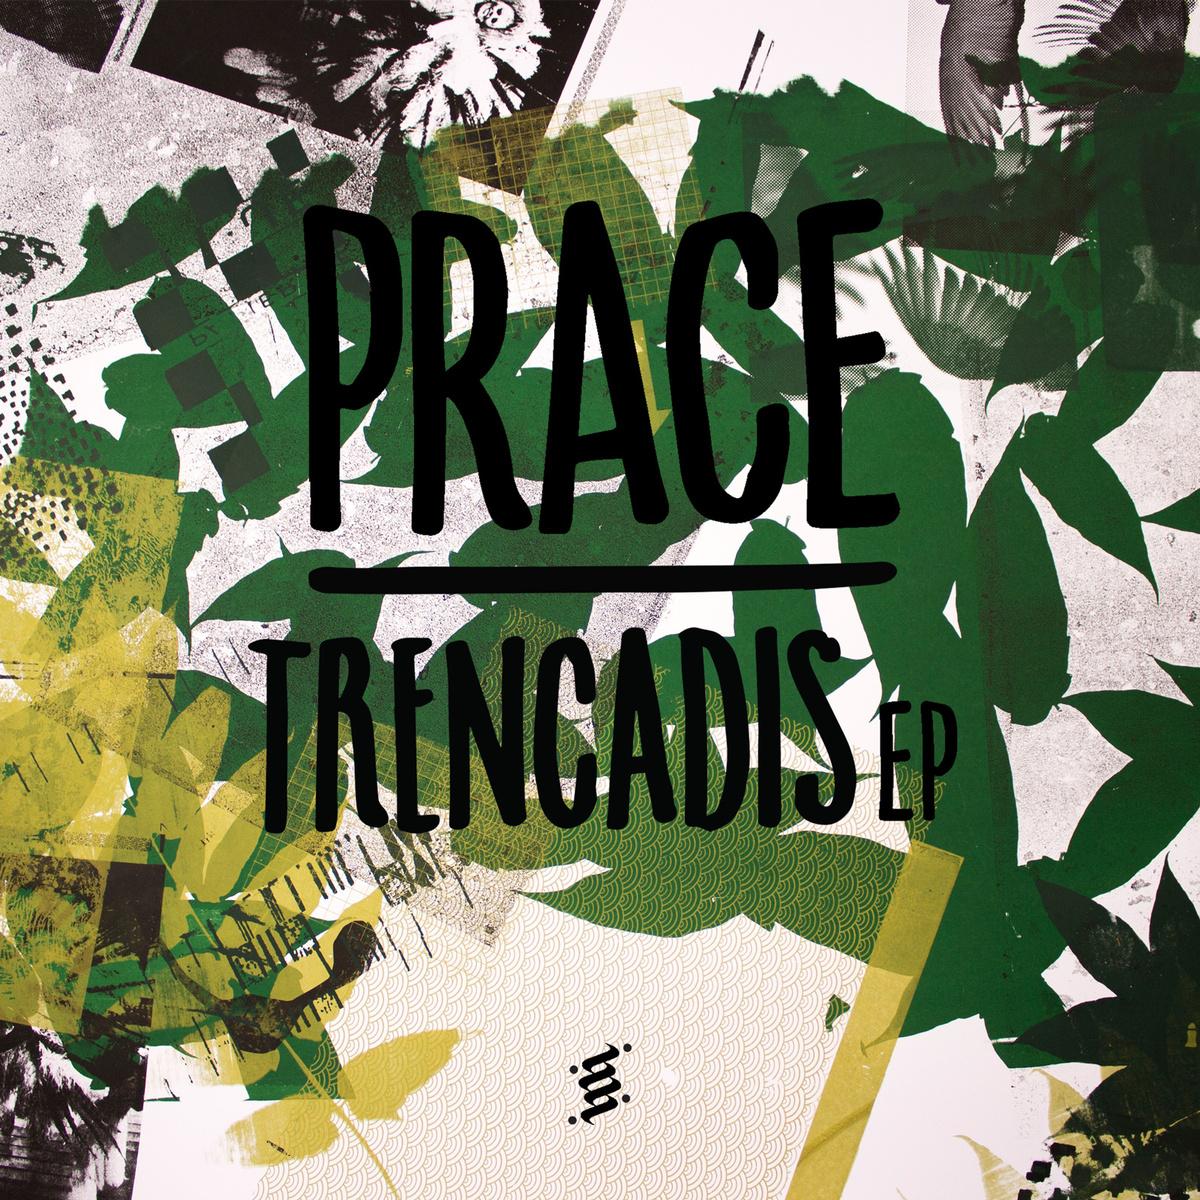 Stream: Prace – Trencadis